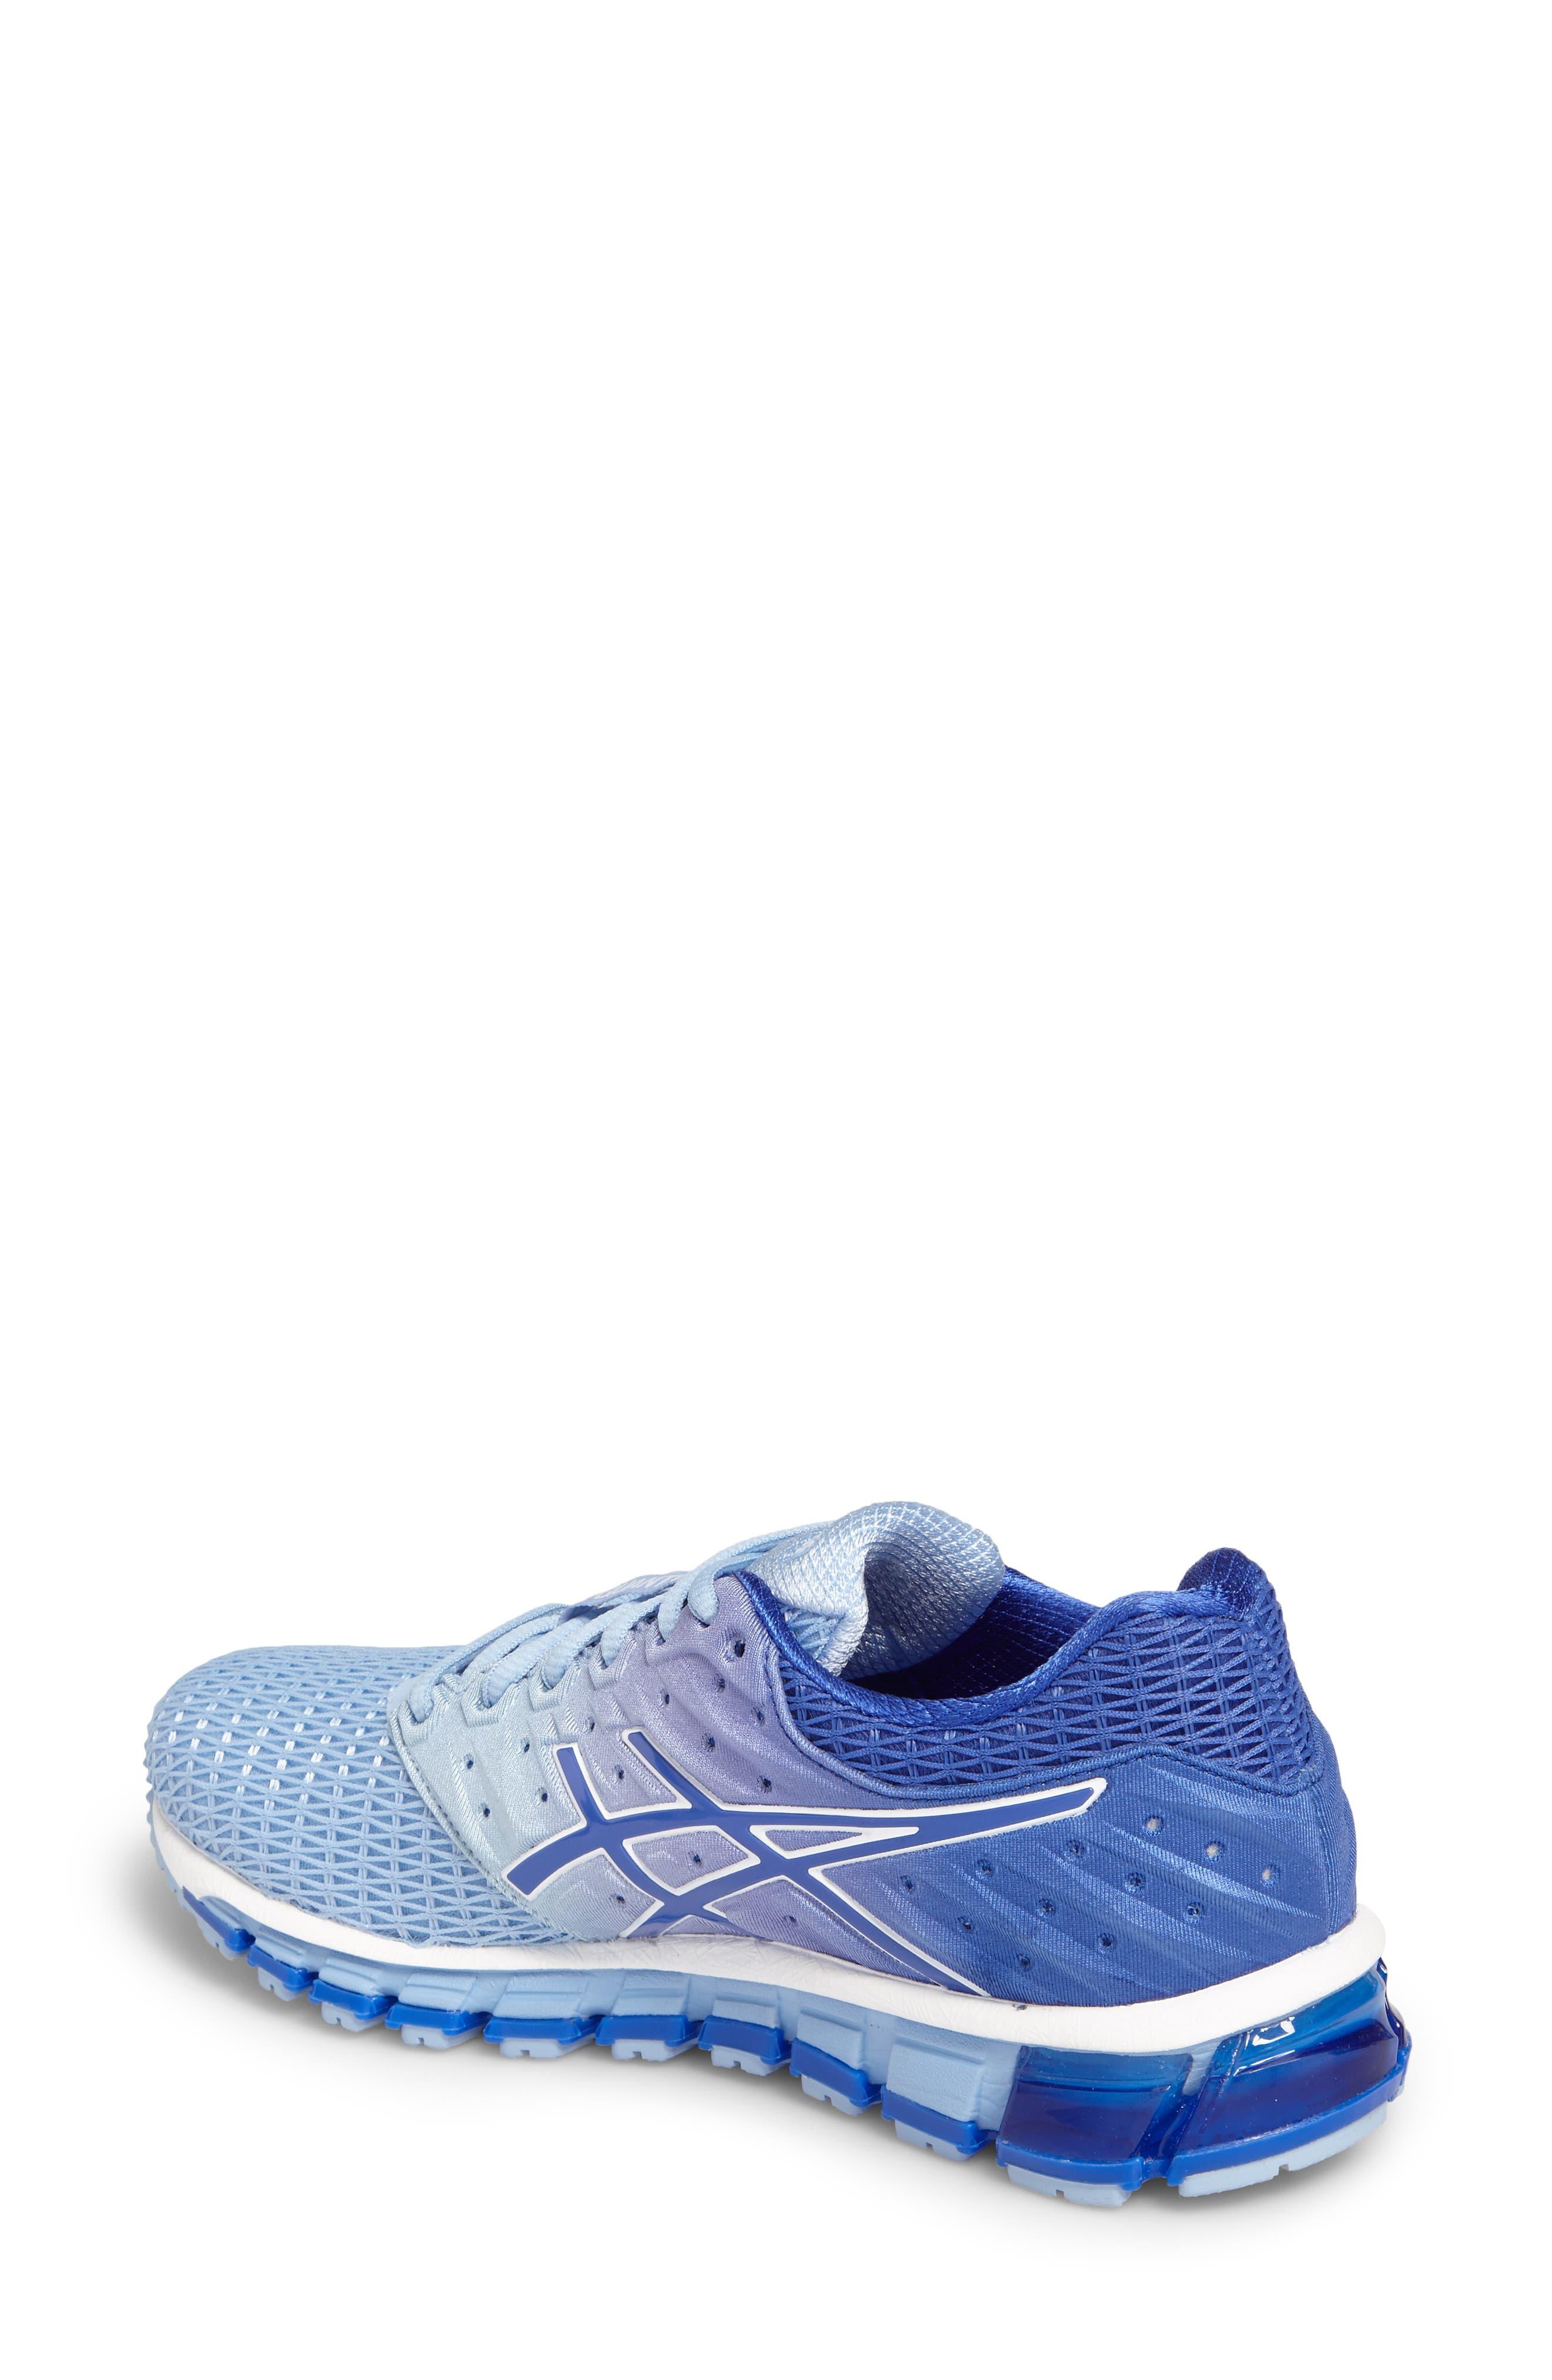 'GEL-Quantum 180 2' Running Shoe,                             Alternate thumbnail 11, color,